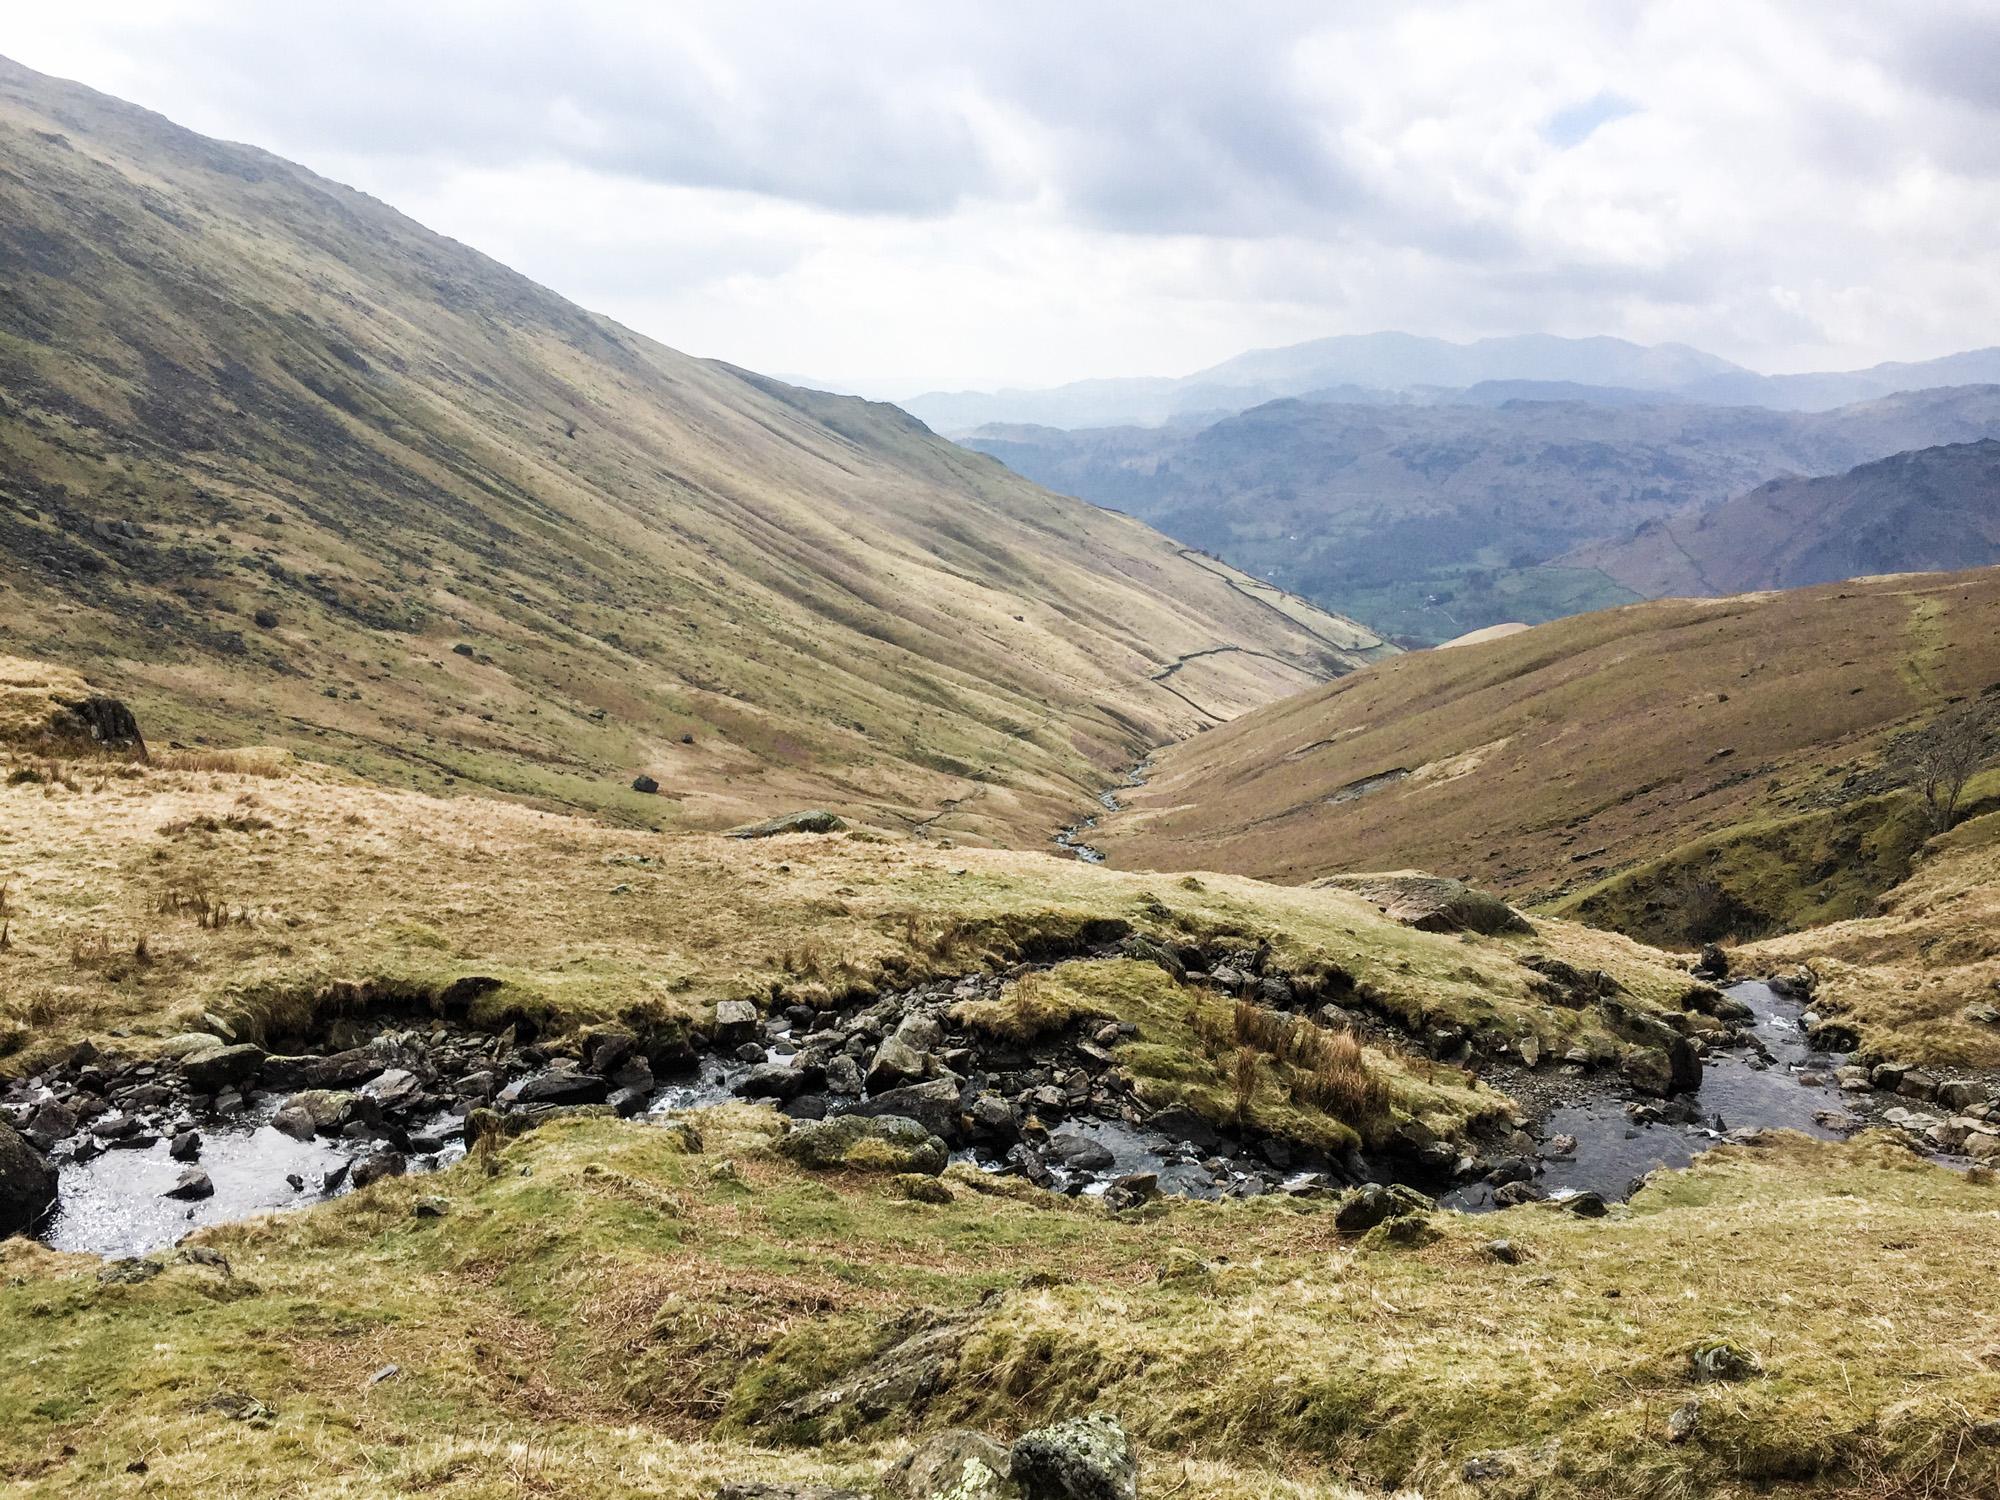 Descent to Grasmere